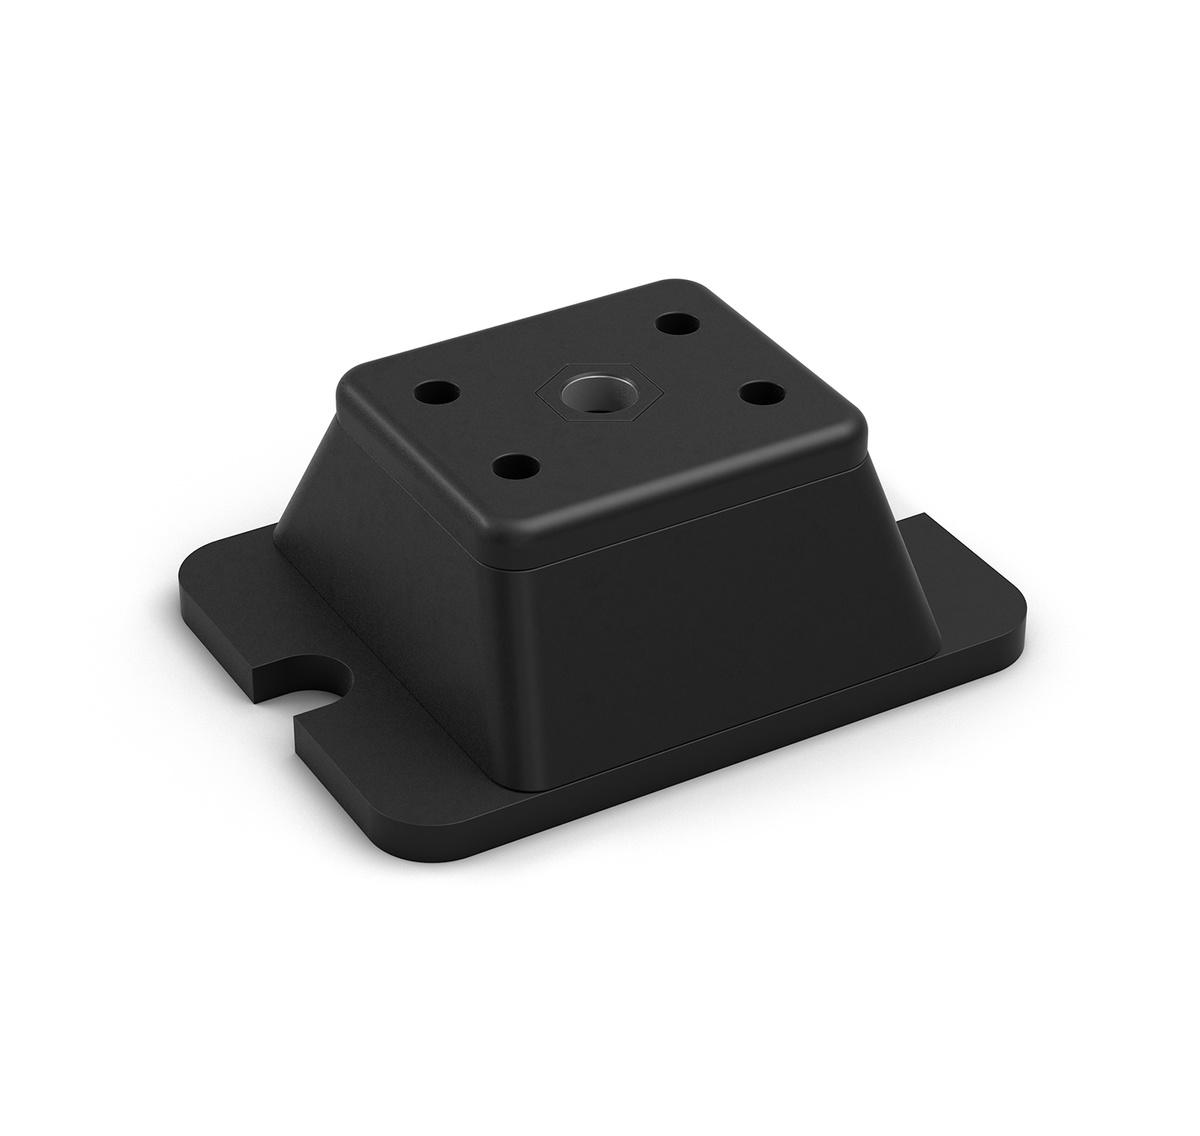 ACE Stoßdämpfer GmbH - Bild - COM-5256